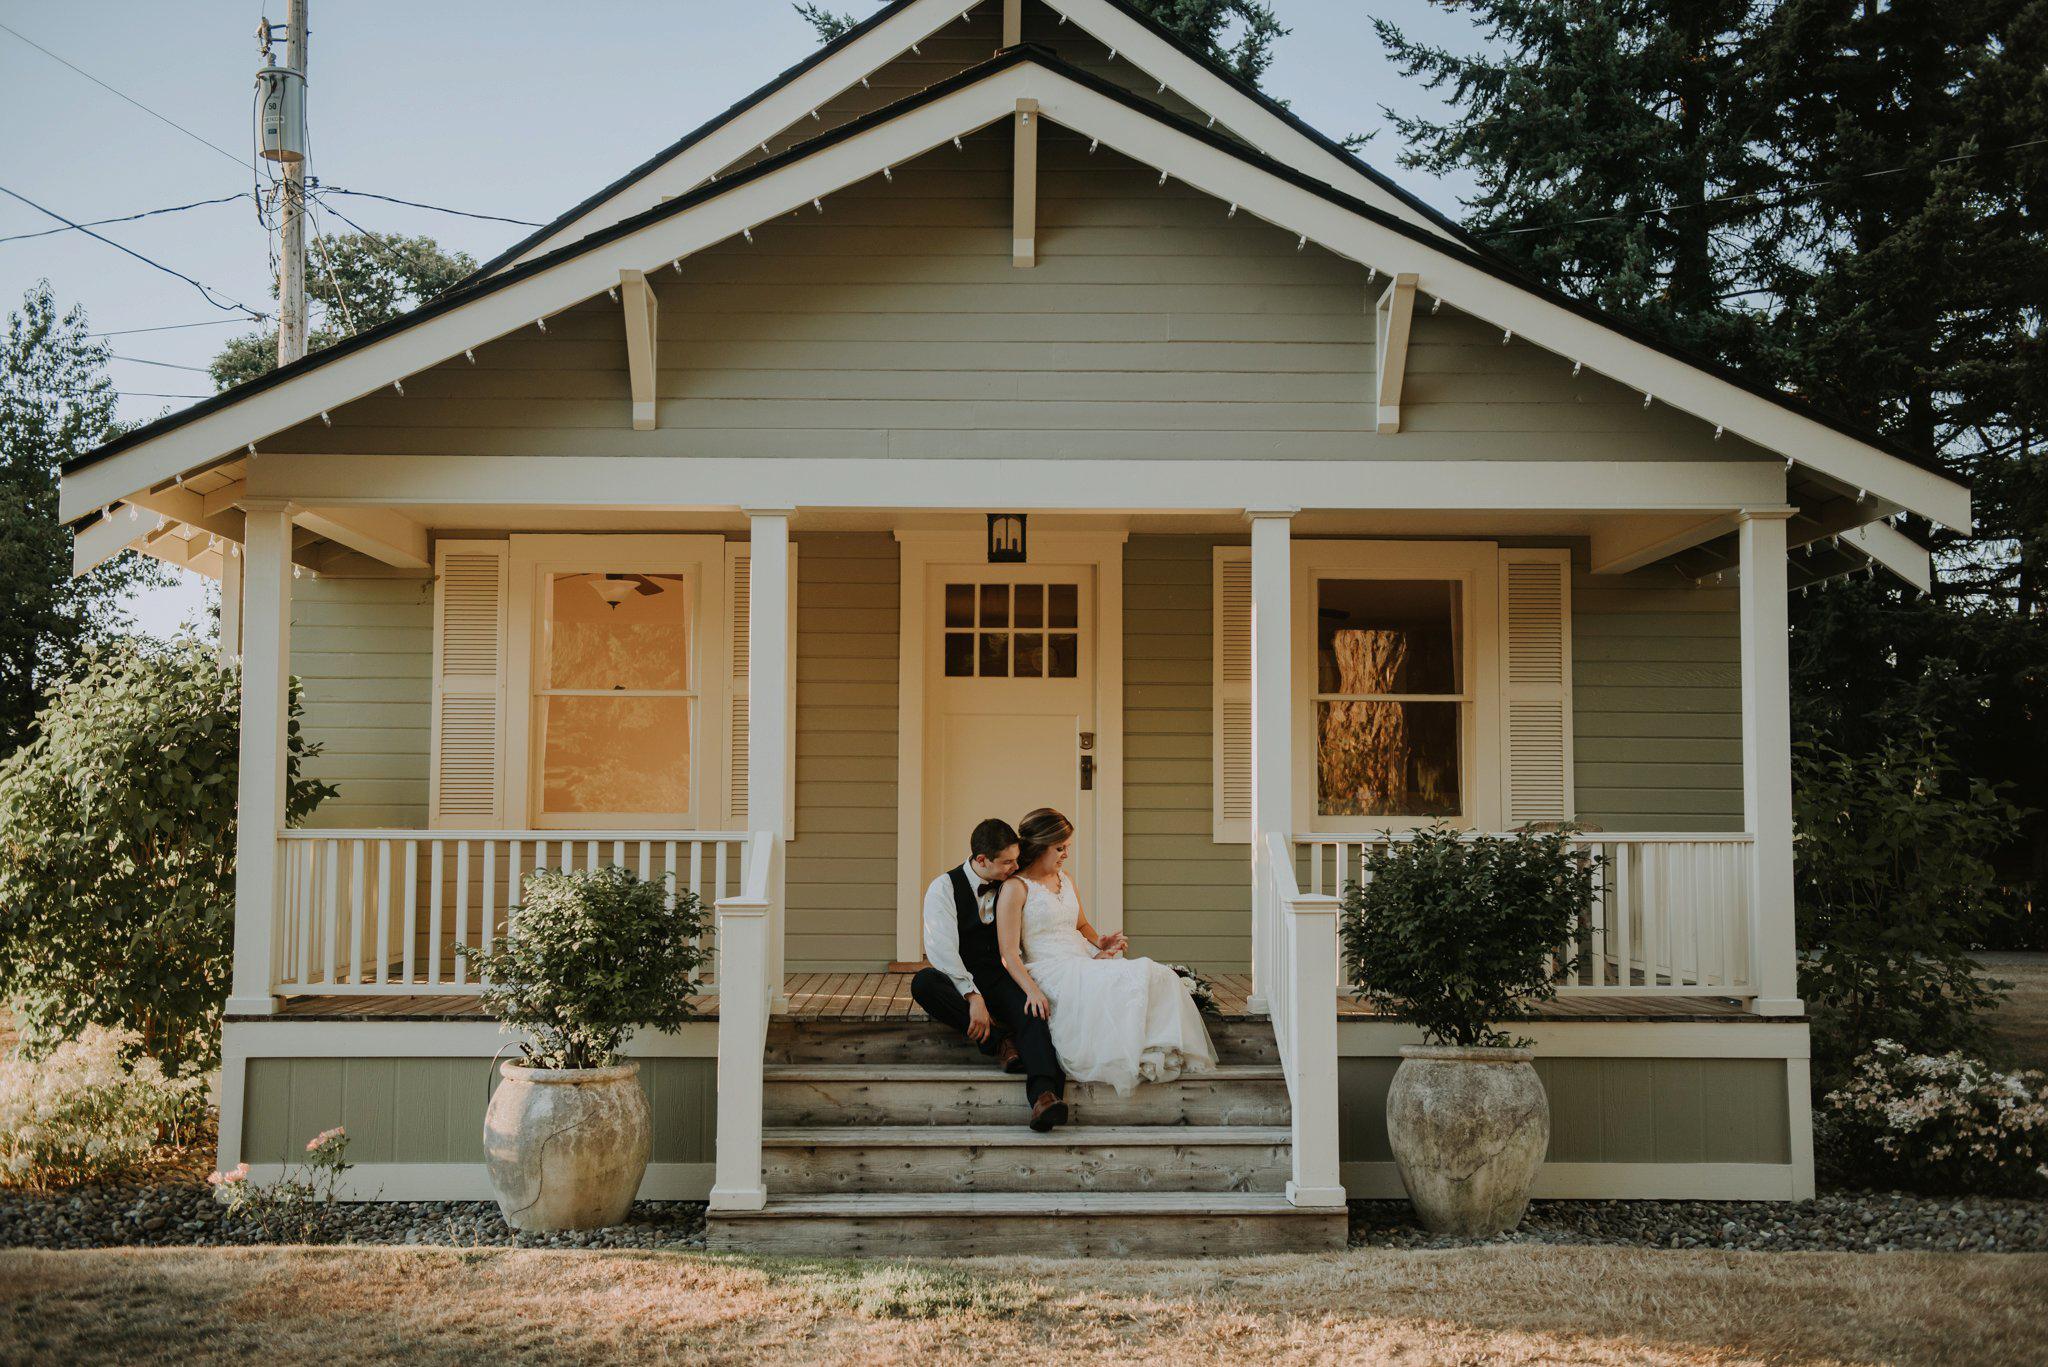 kristen-and-cody-the-kelley-farm-wedding-seattle-photographer-caitlyn-nikula-96.jpg